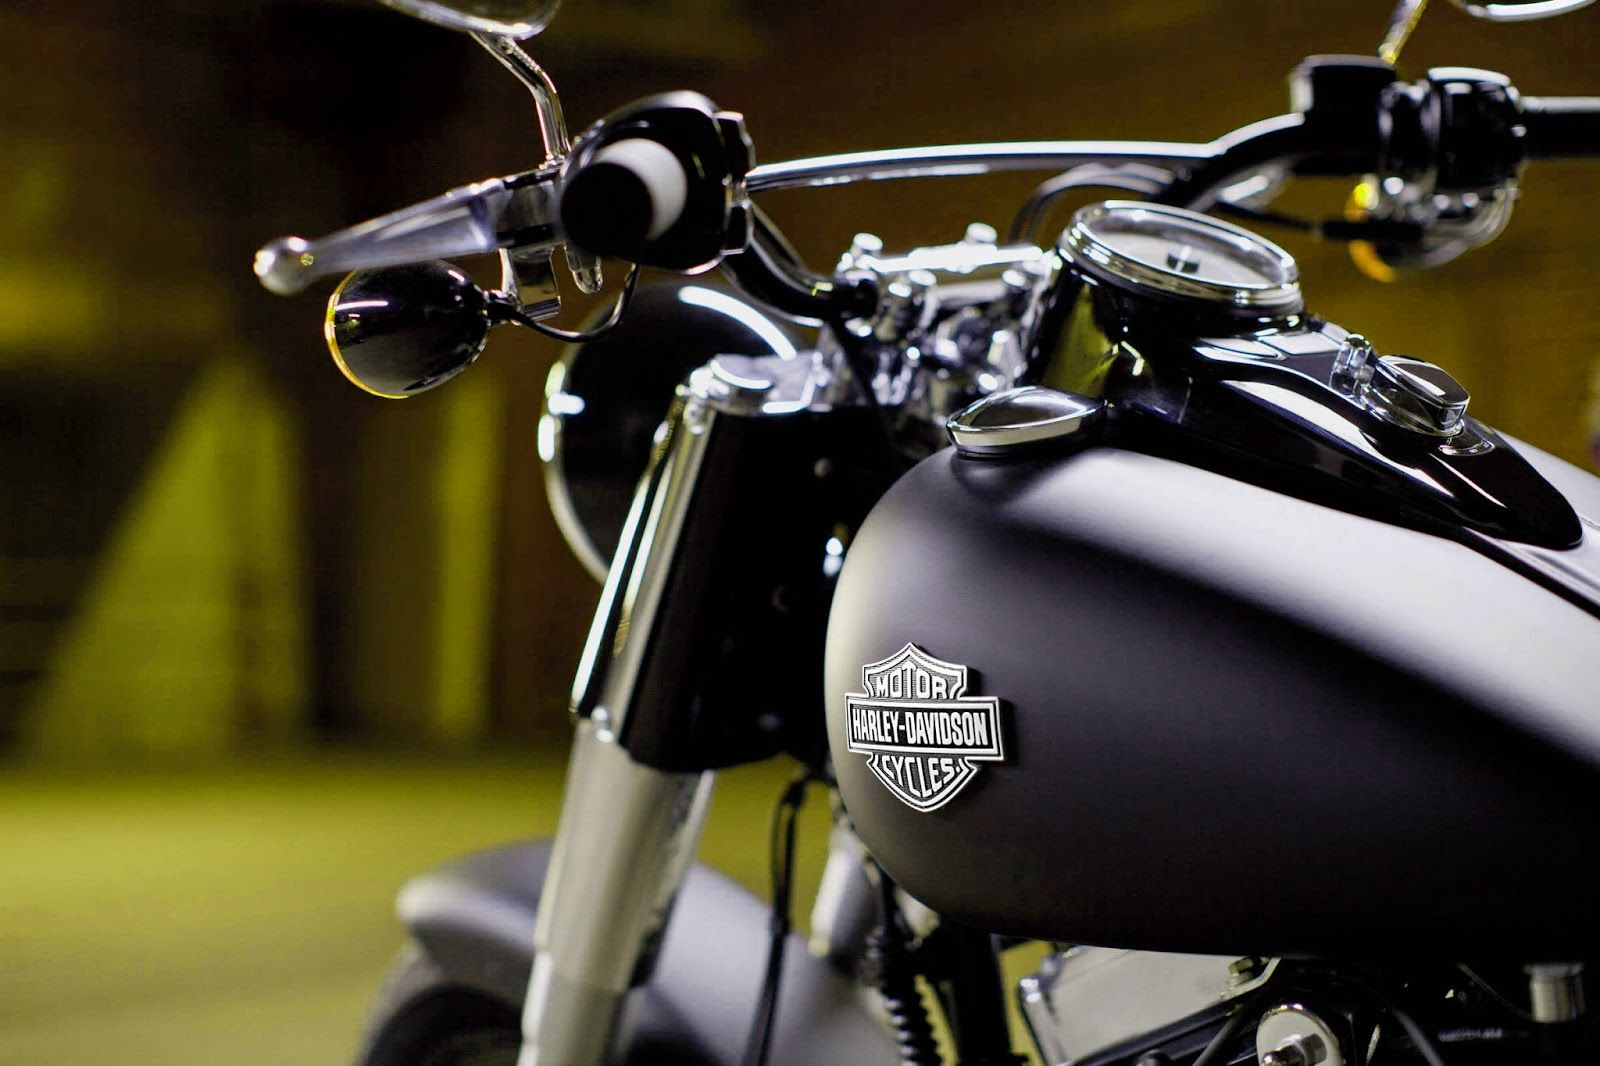 Amazing Wallpaper High Resolution Harley Davidson - a64f41ad7eb5c9bed3d8924b710a9dc5  Pic_637424.jpg